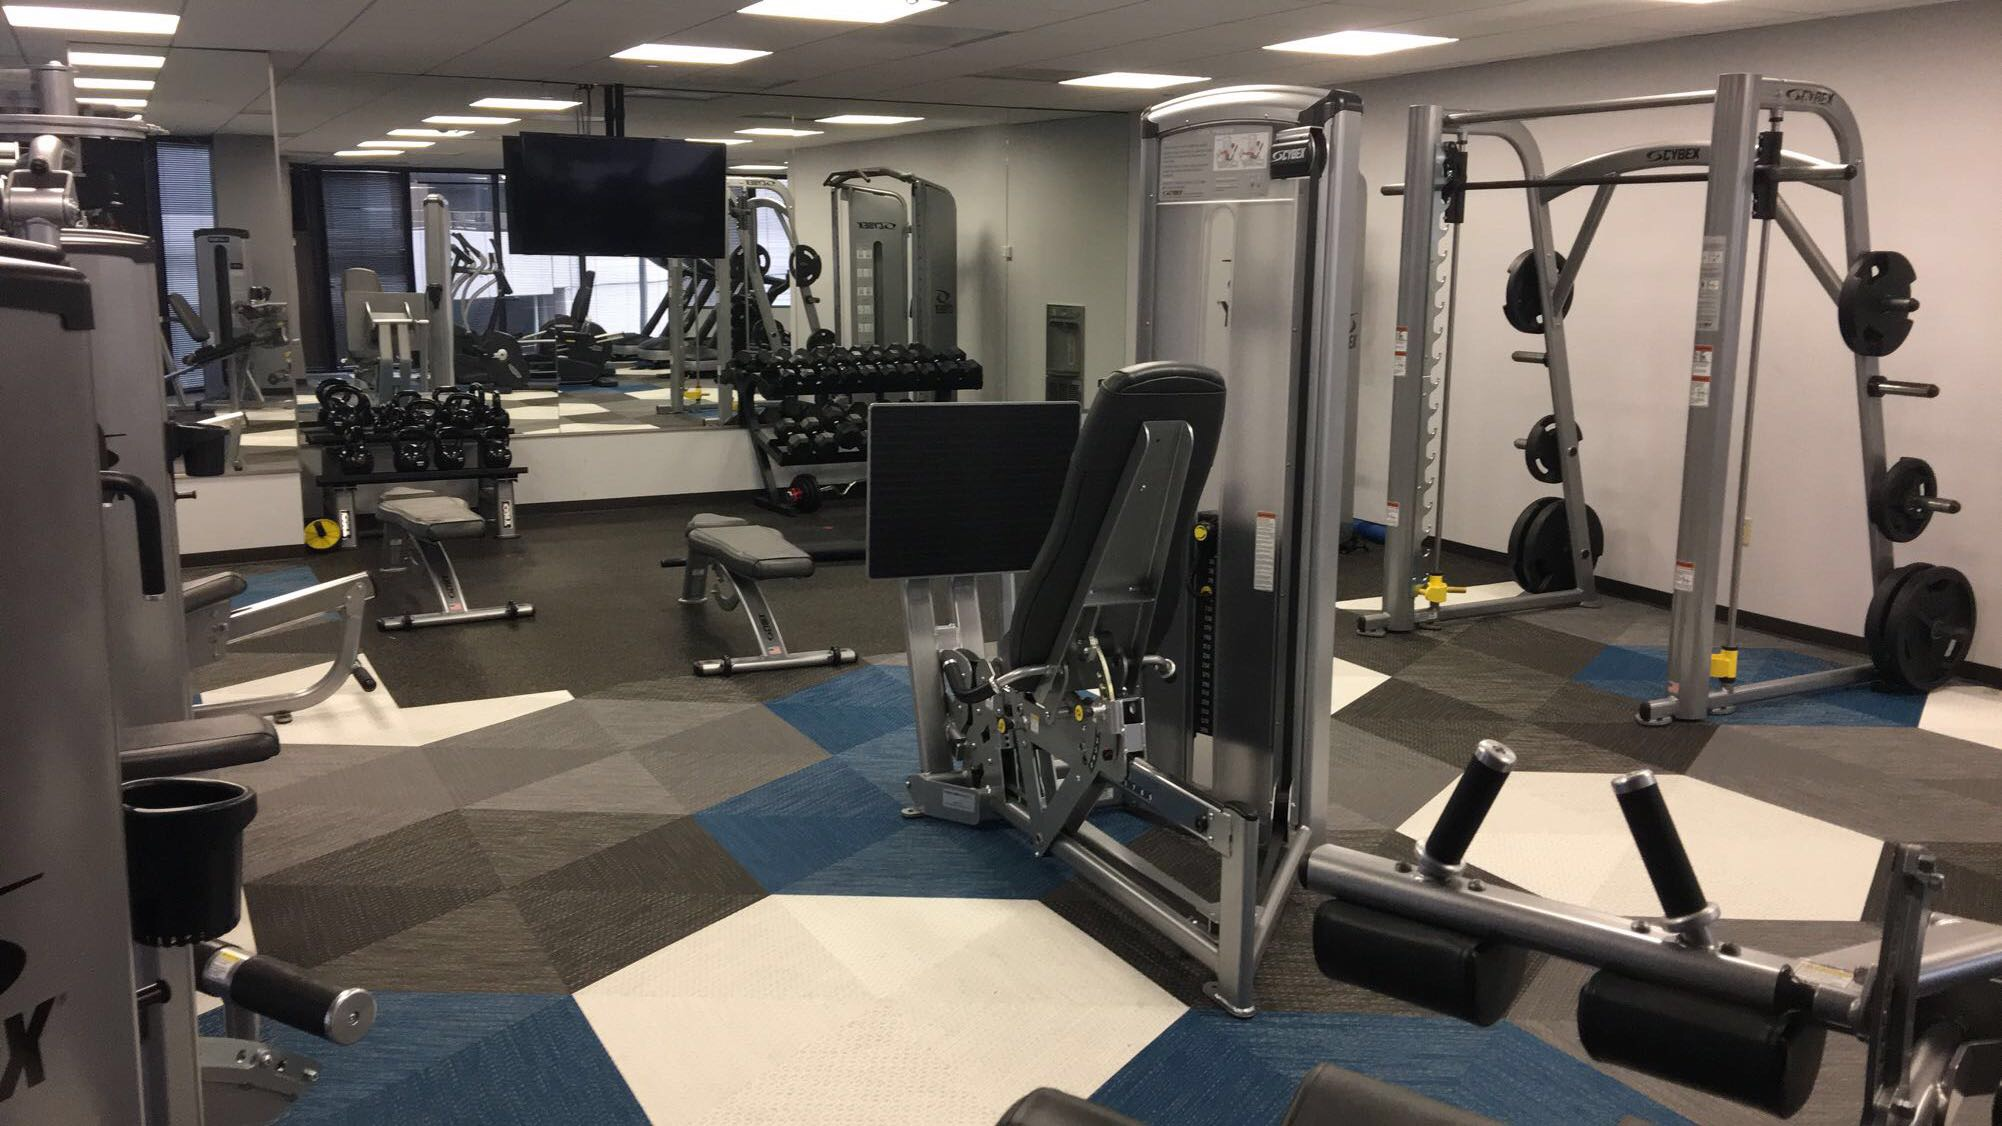 Building Fitness Center